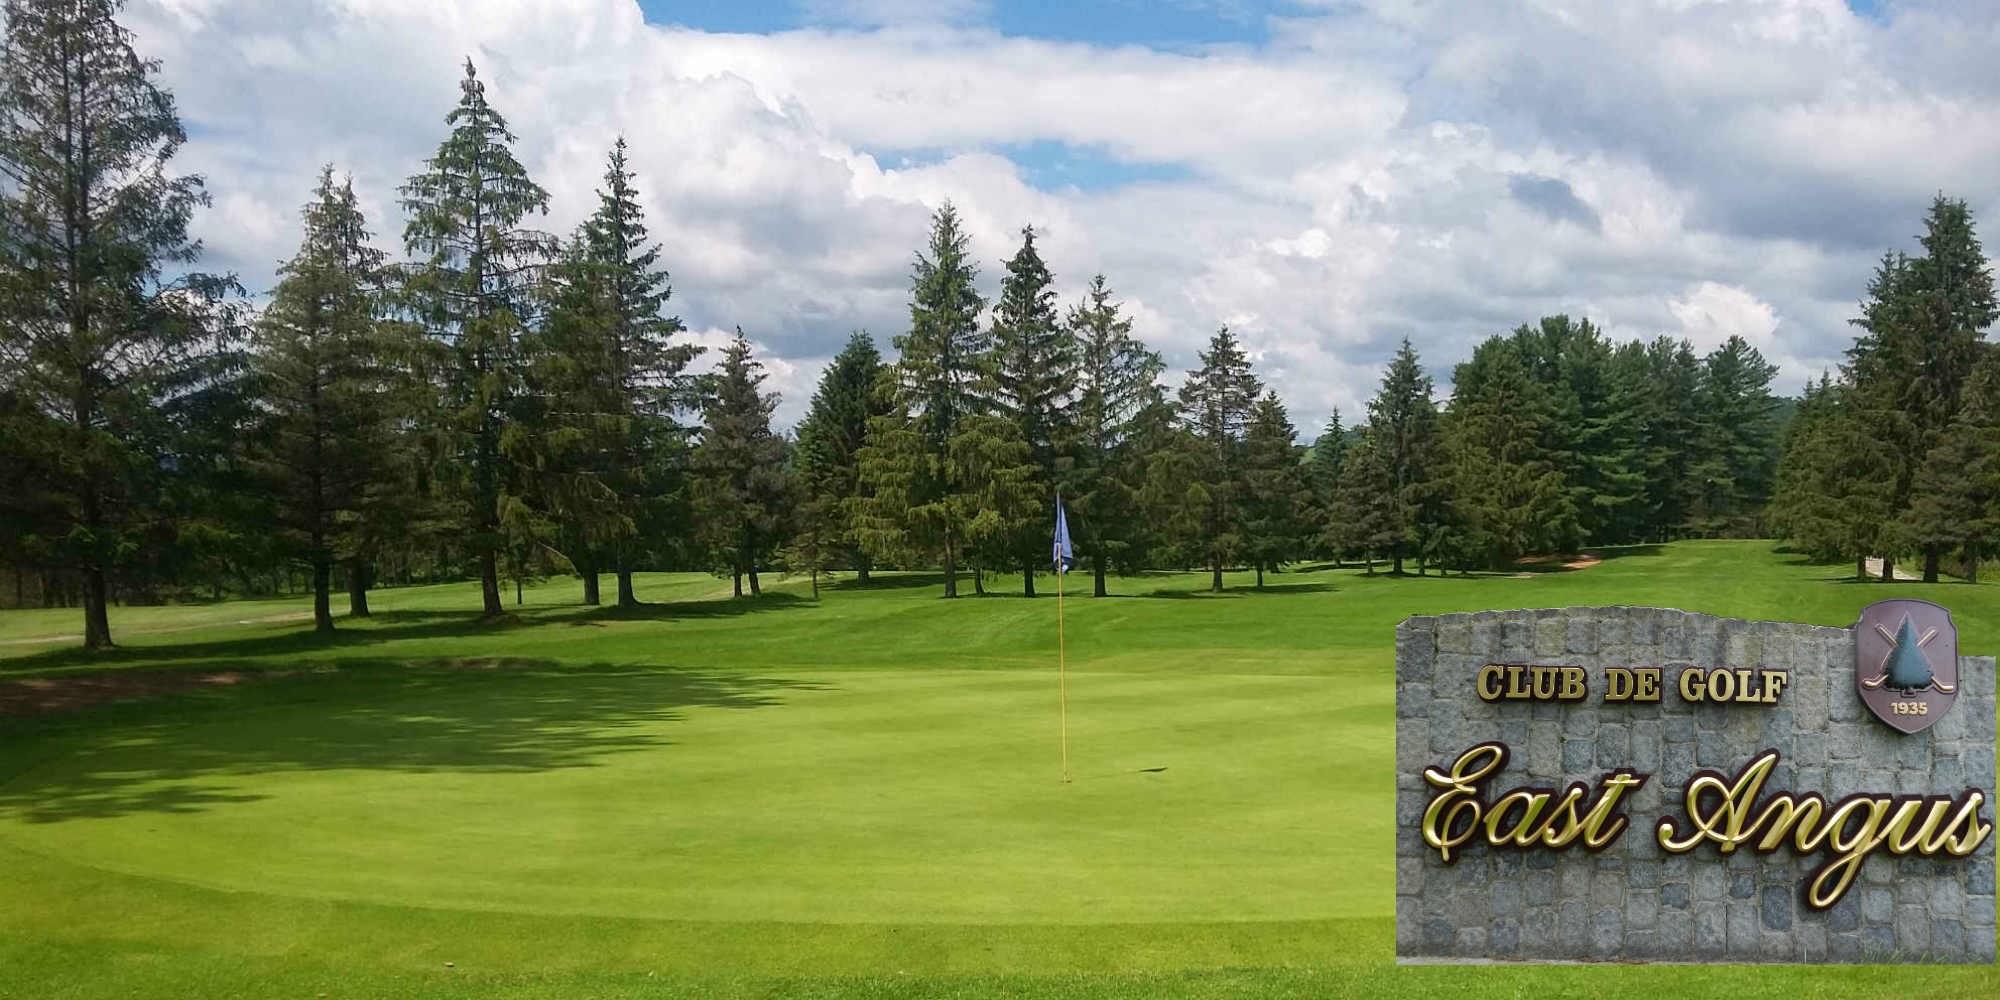 golf-east-angus